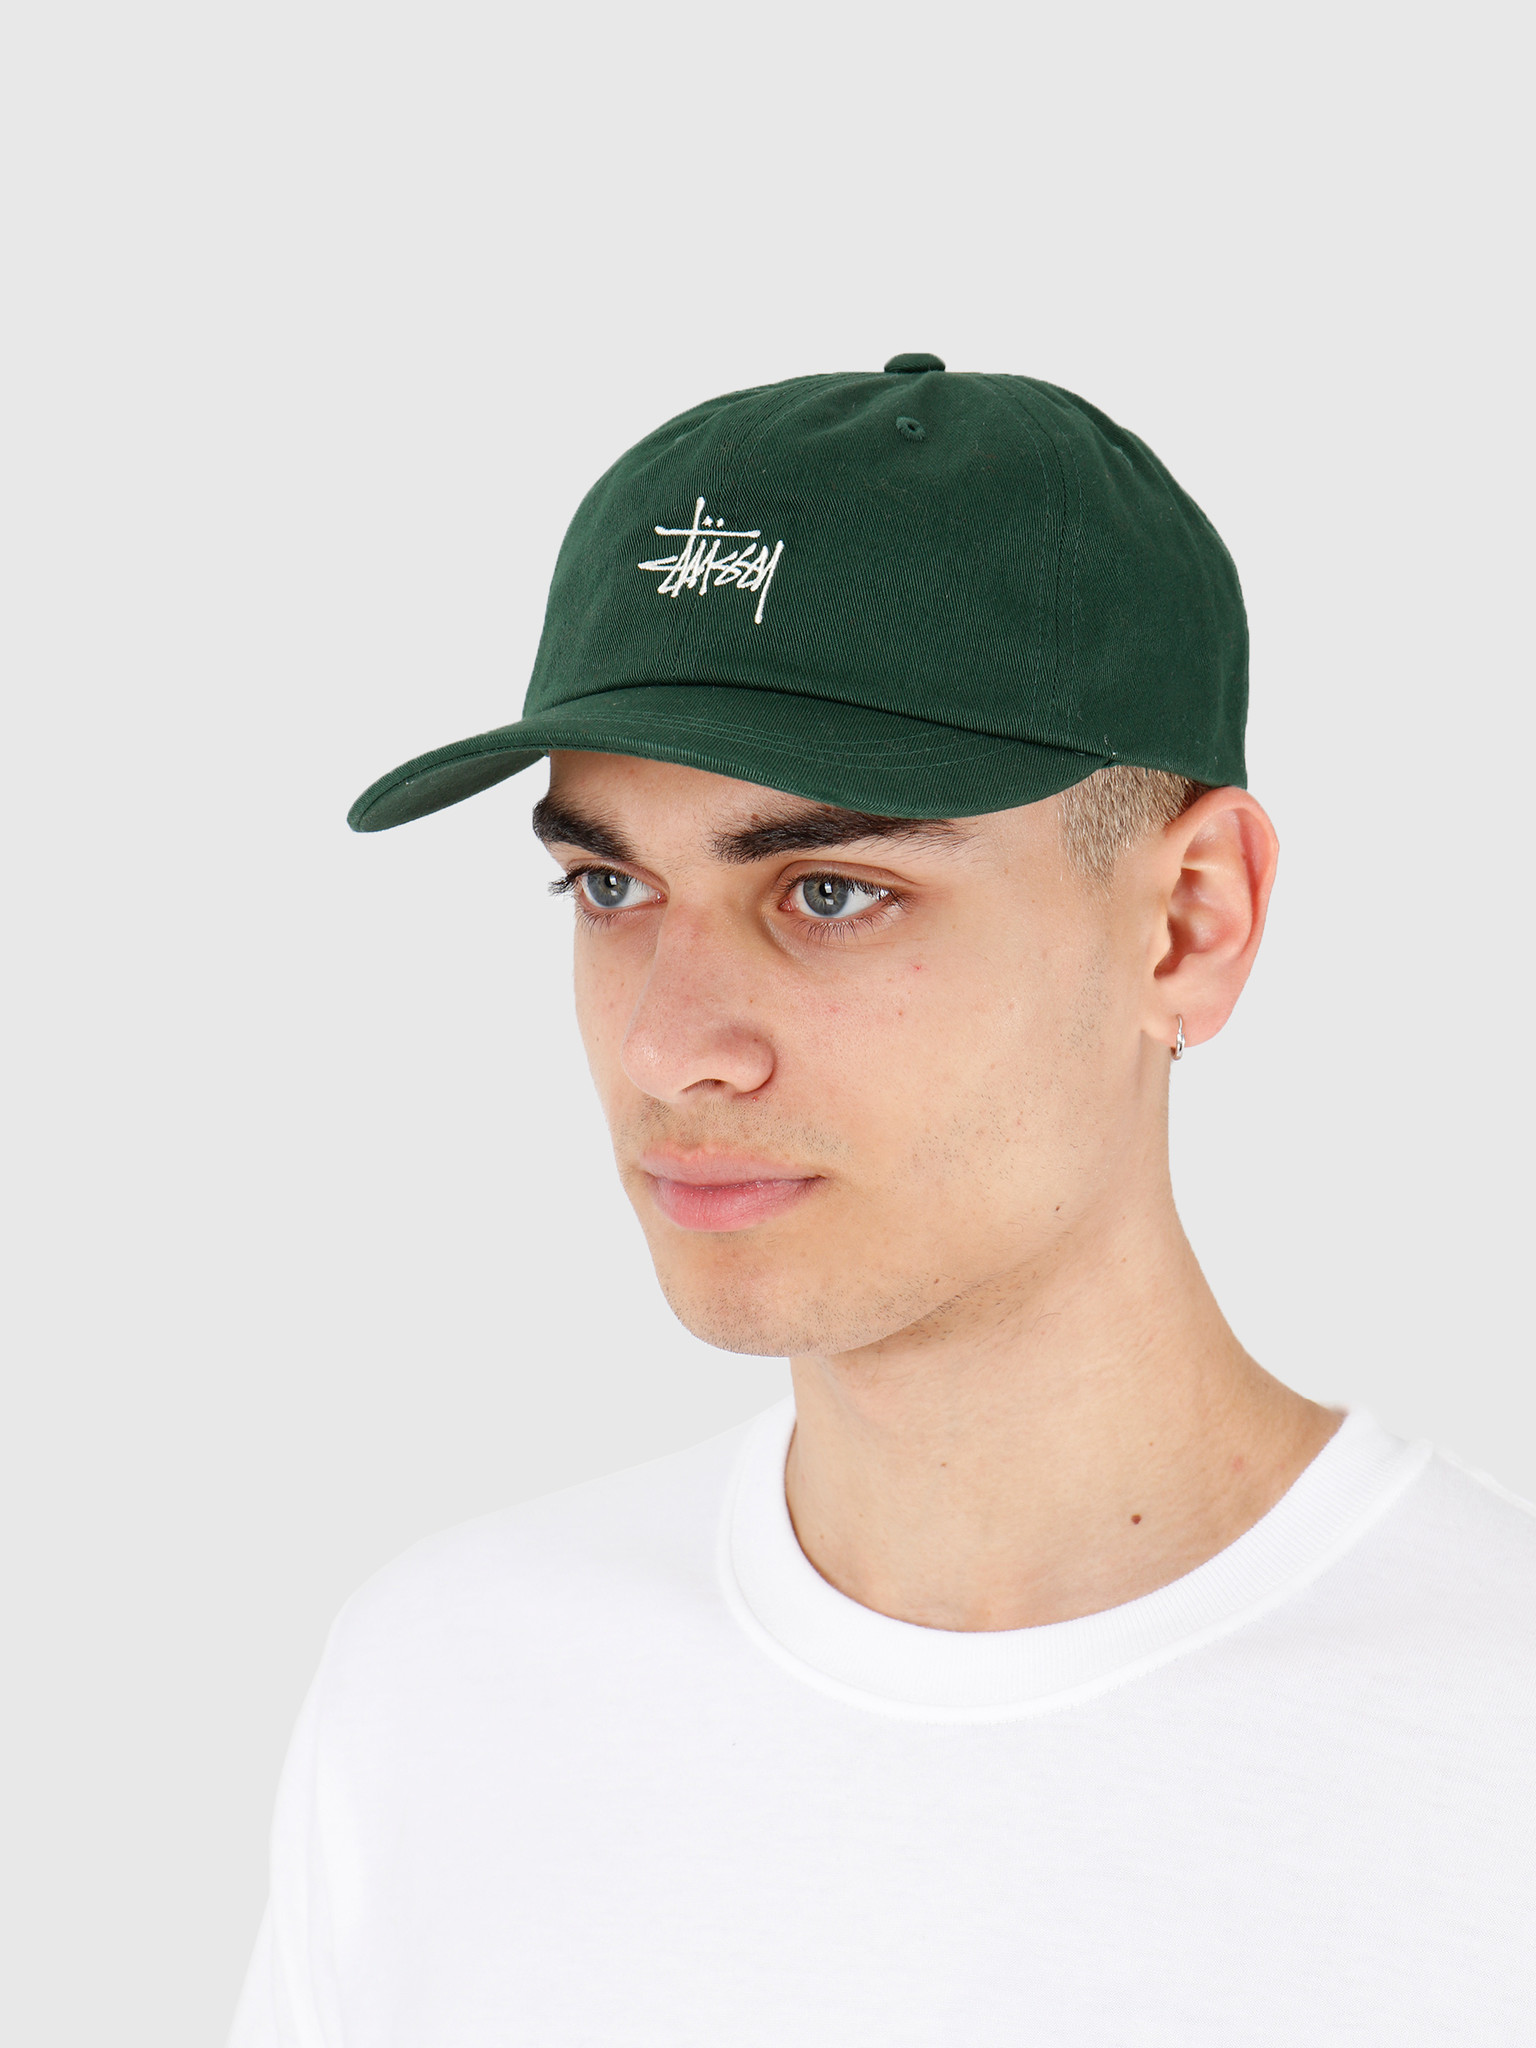 Stussy Stussy Ho19 Stock Low Pro Cap Green 131916